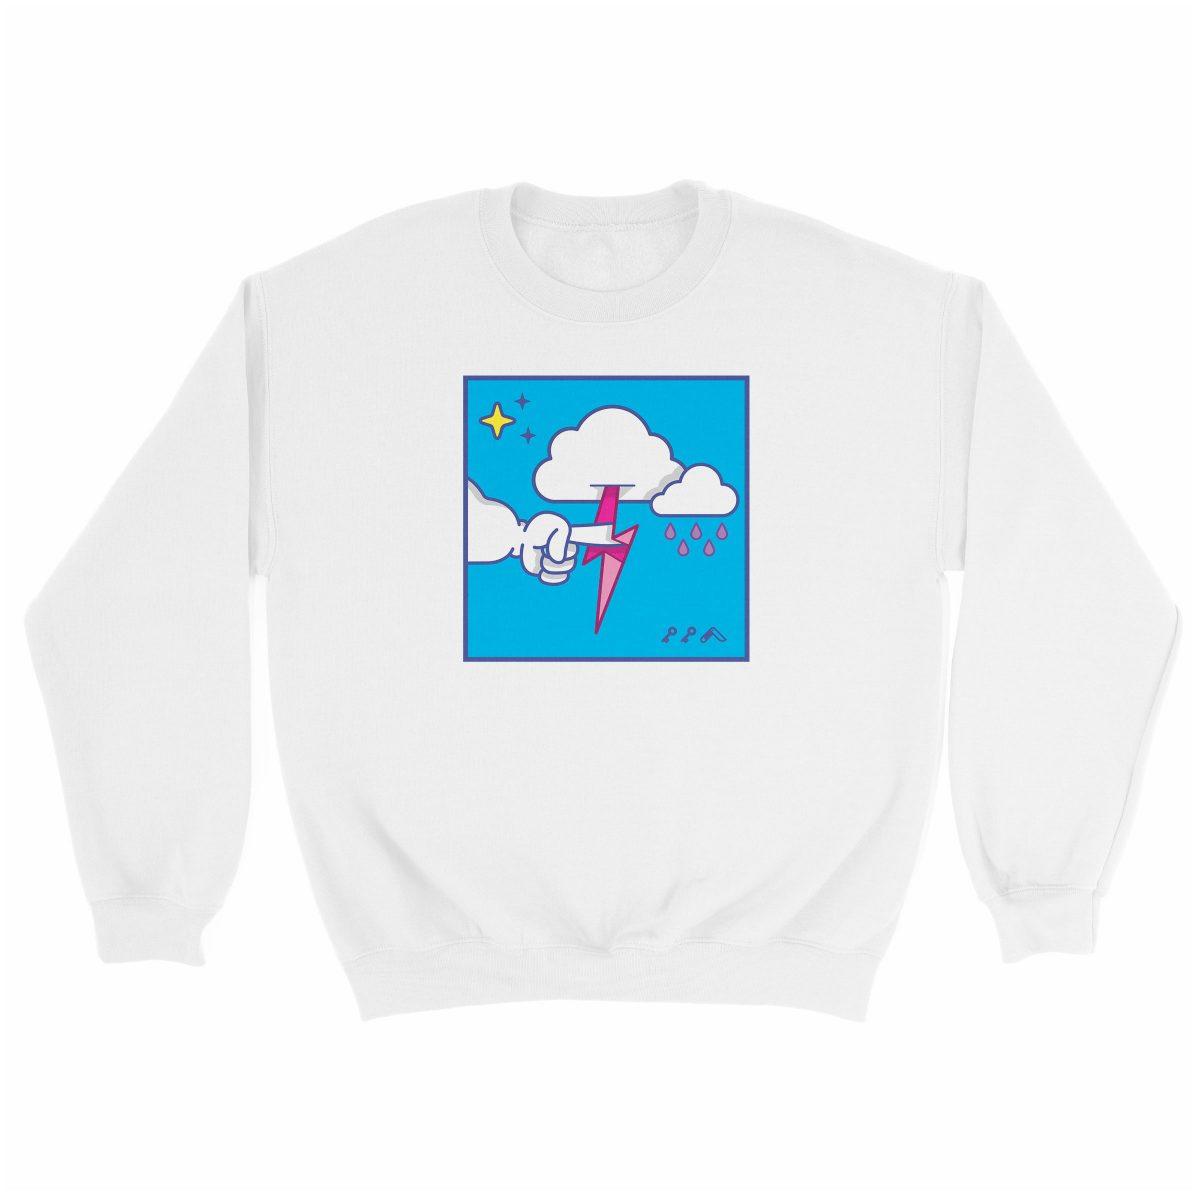 """MUTUAL CLOUDSENT"" funny adult cartoon animation style sweatshirt in white at kikicutt.com"